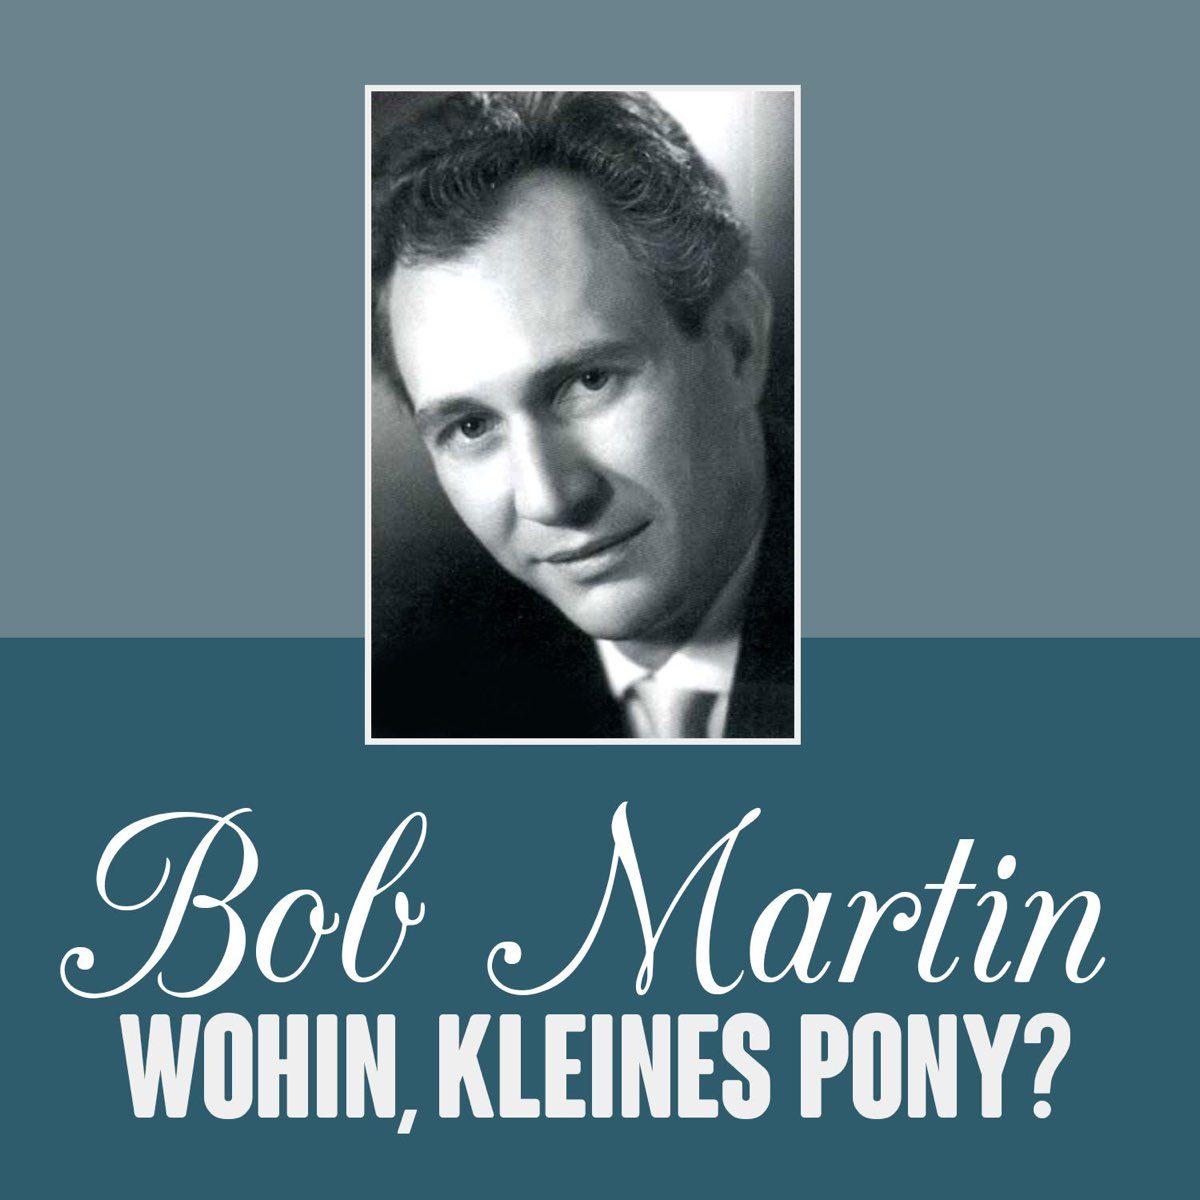 bob martin wohin kleines pony